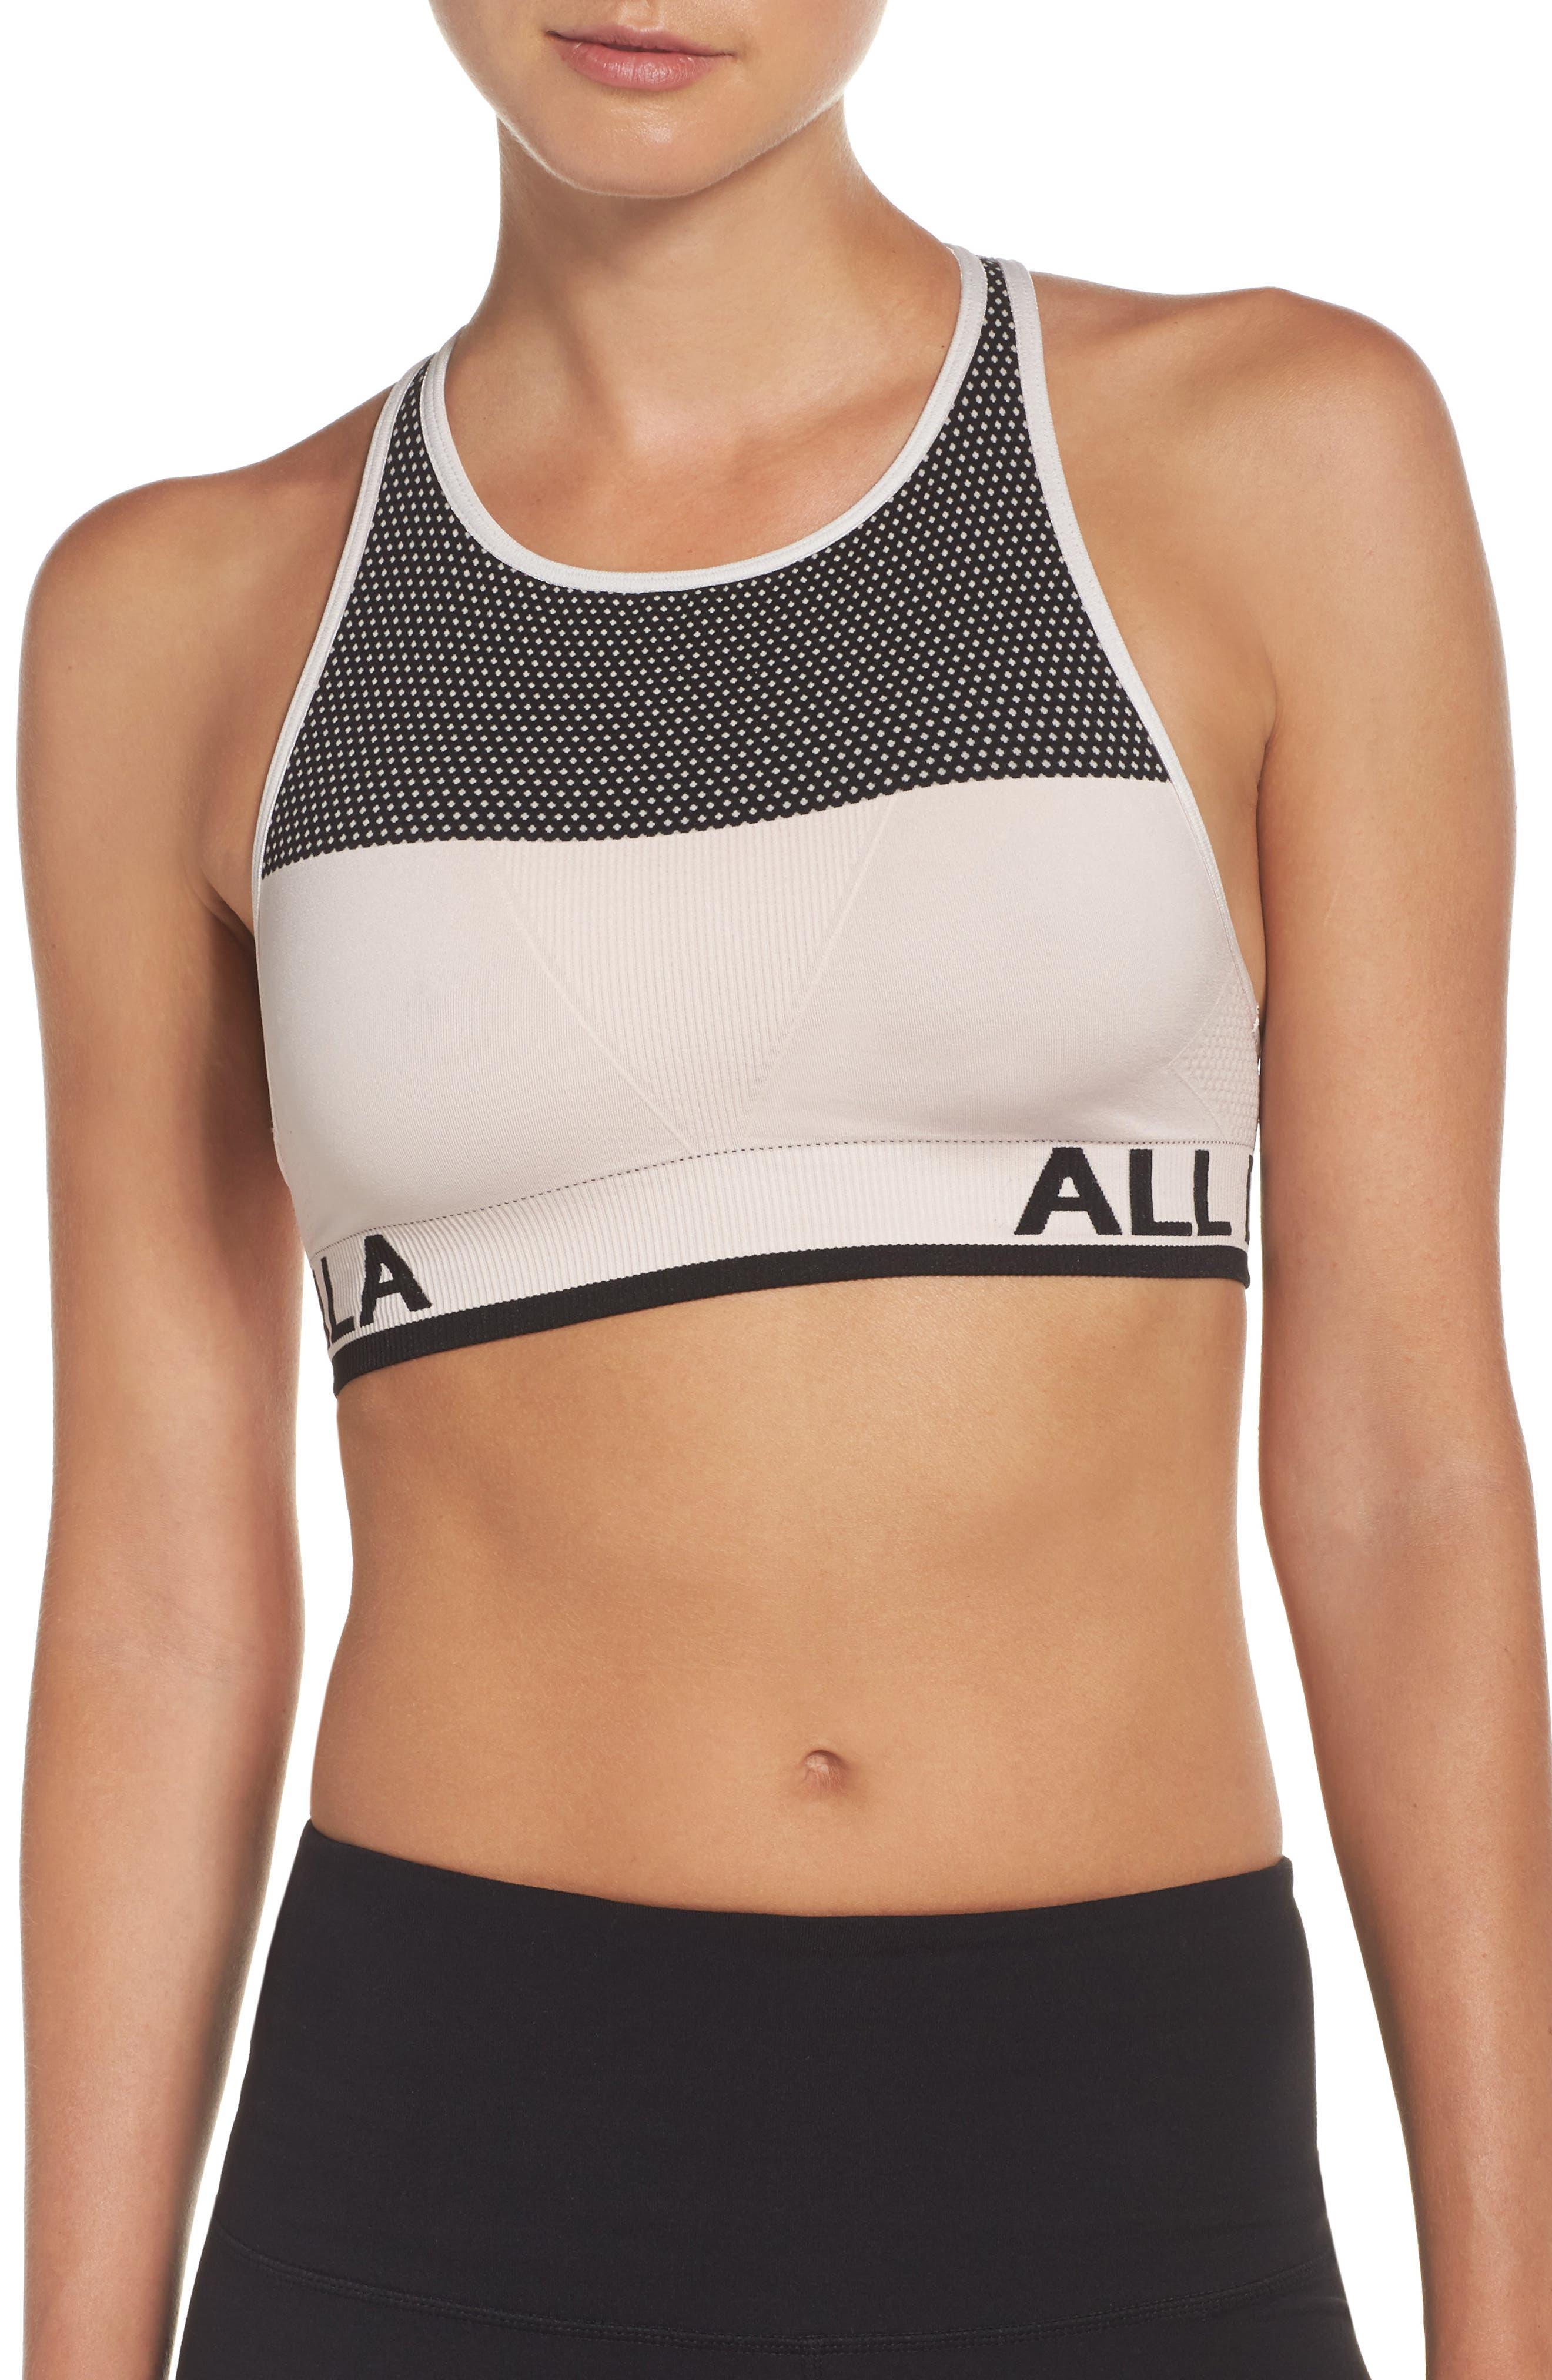 Main Image - ALALA Ace Seamless Sports Bra